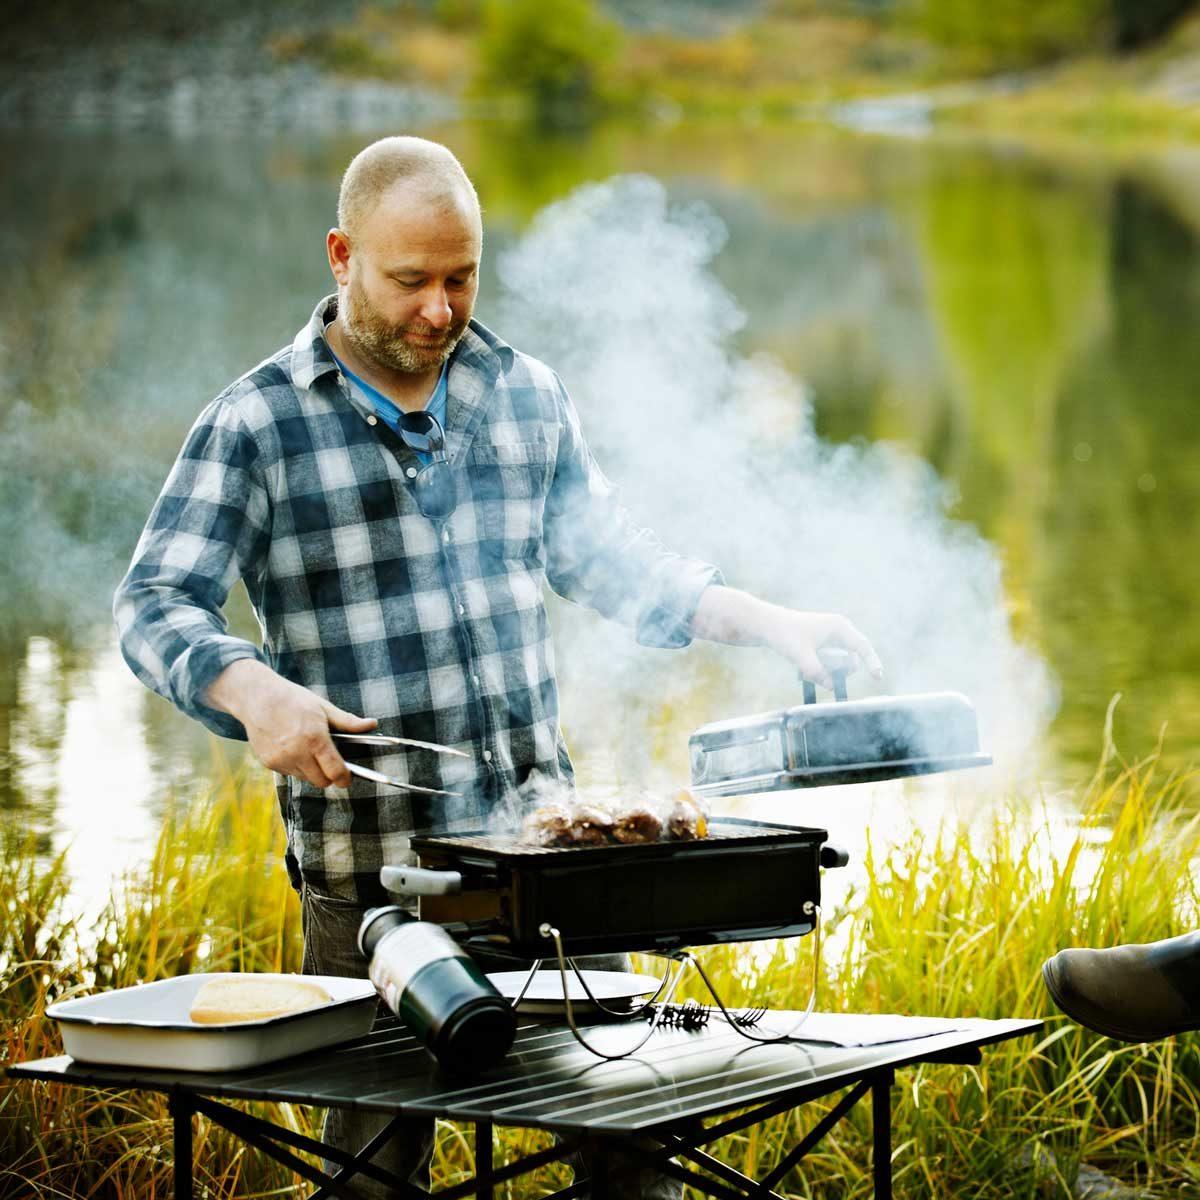 Man grilling by lake